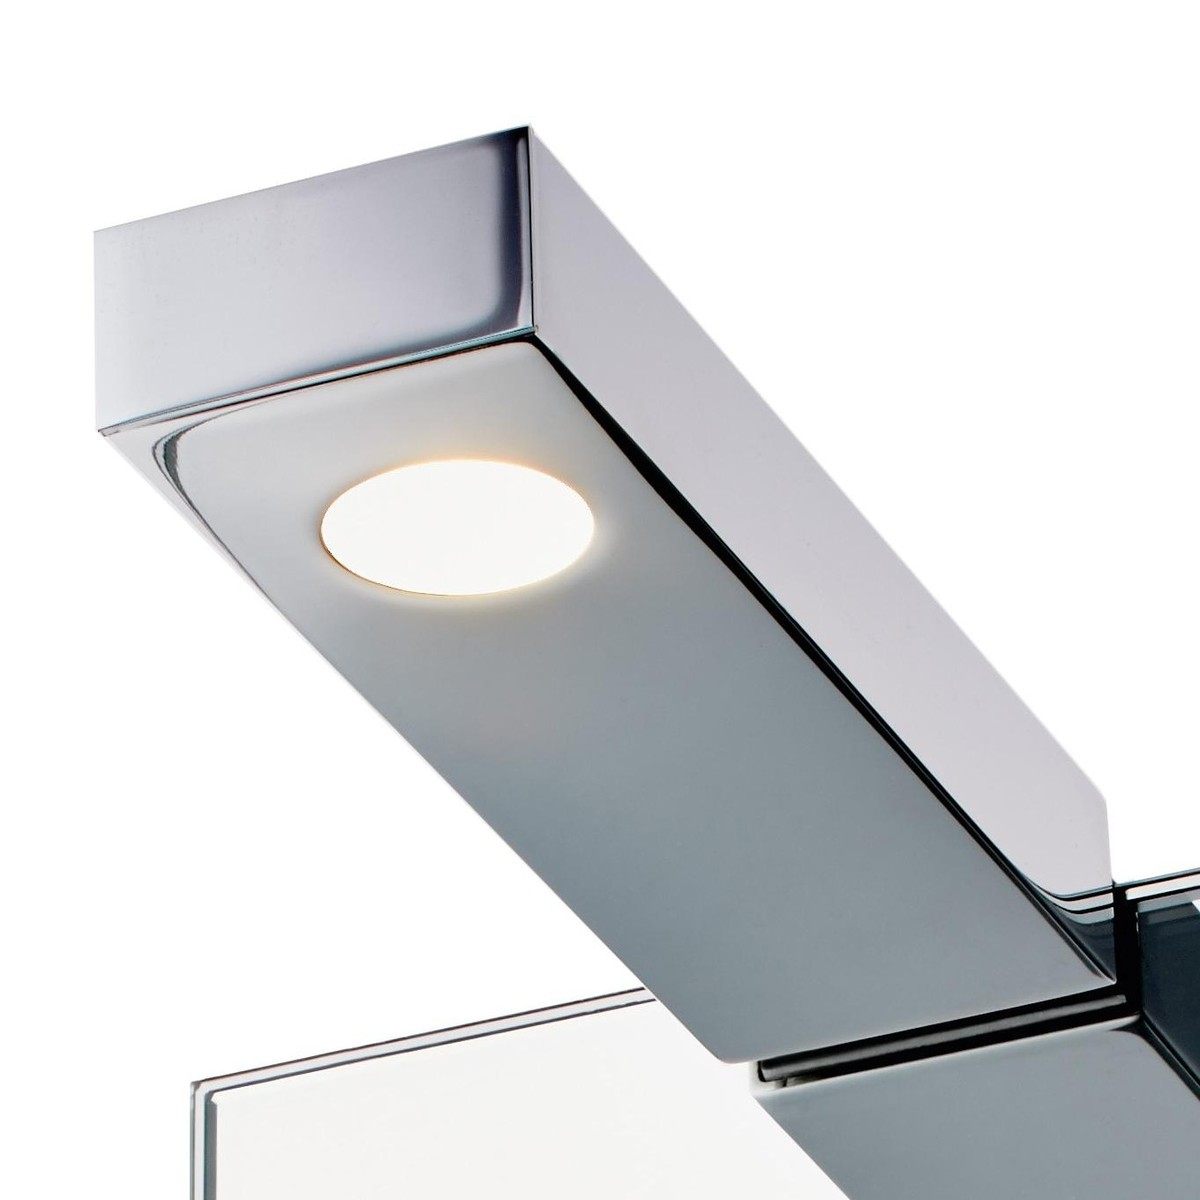 Flat 1 led lampe pour miroir decor walther for Lampe miroir